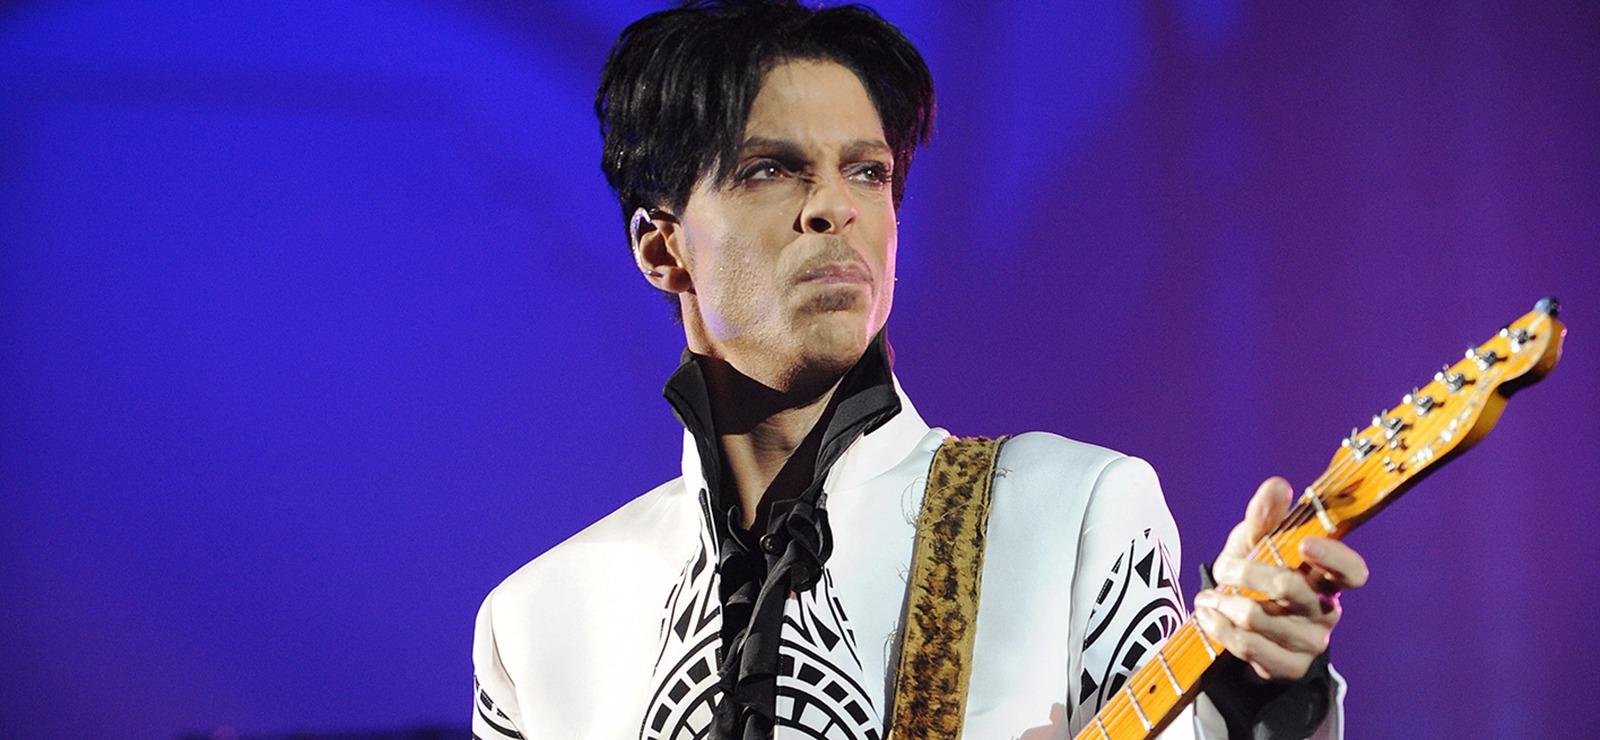 Prince : Cadeau d'adieu